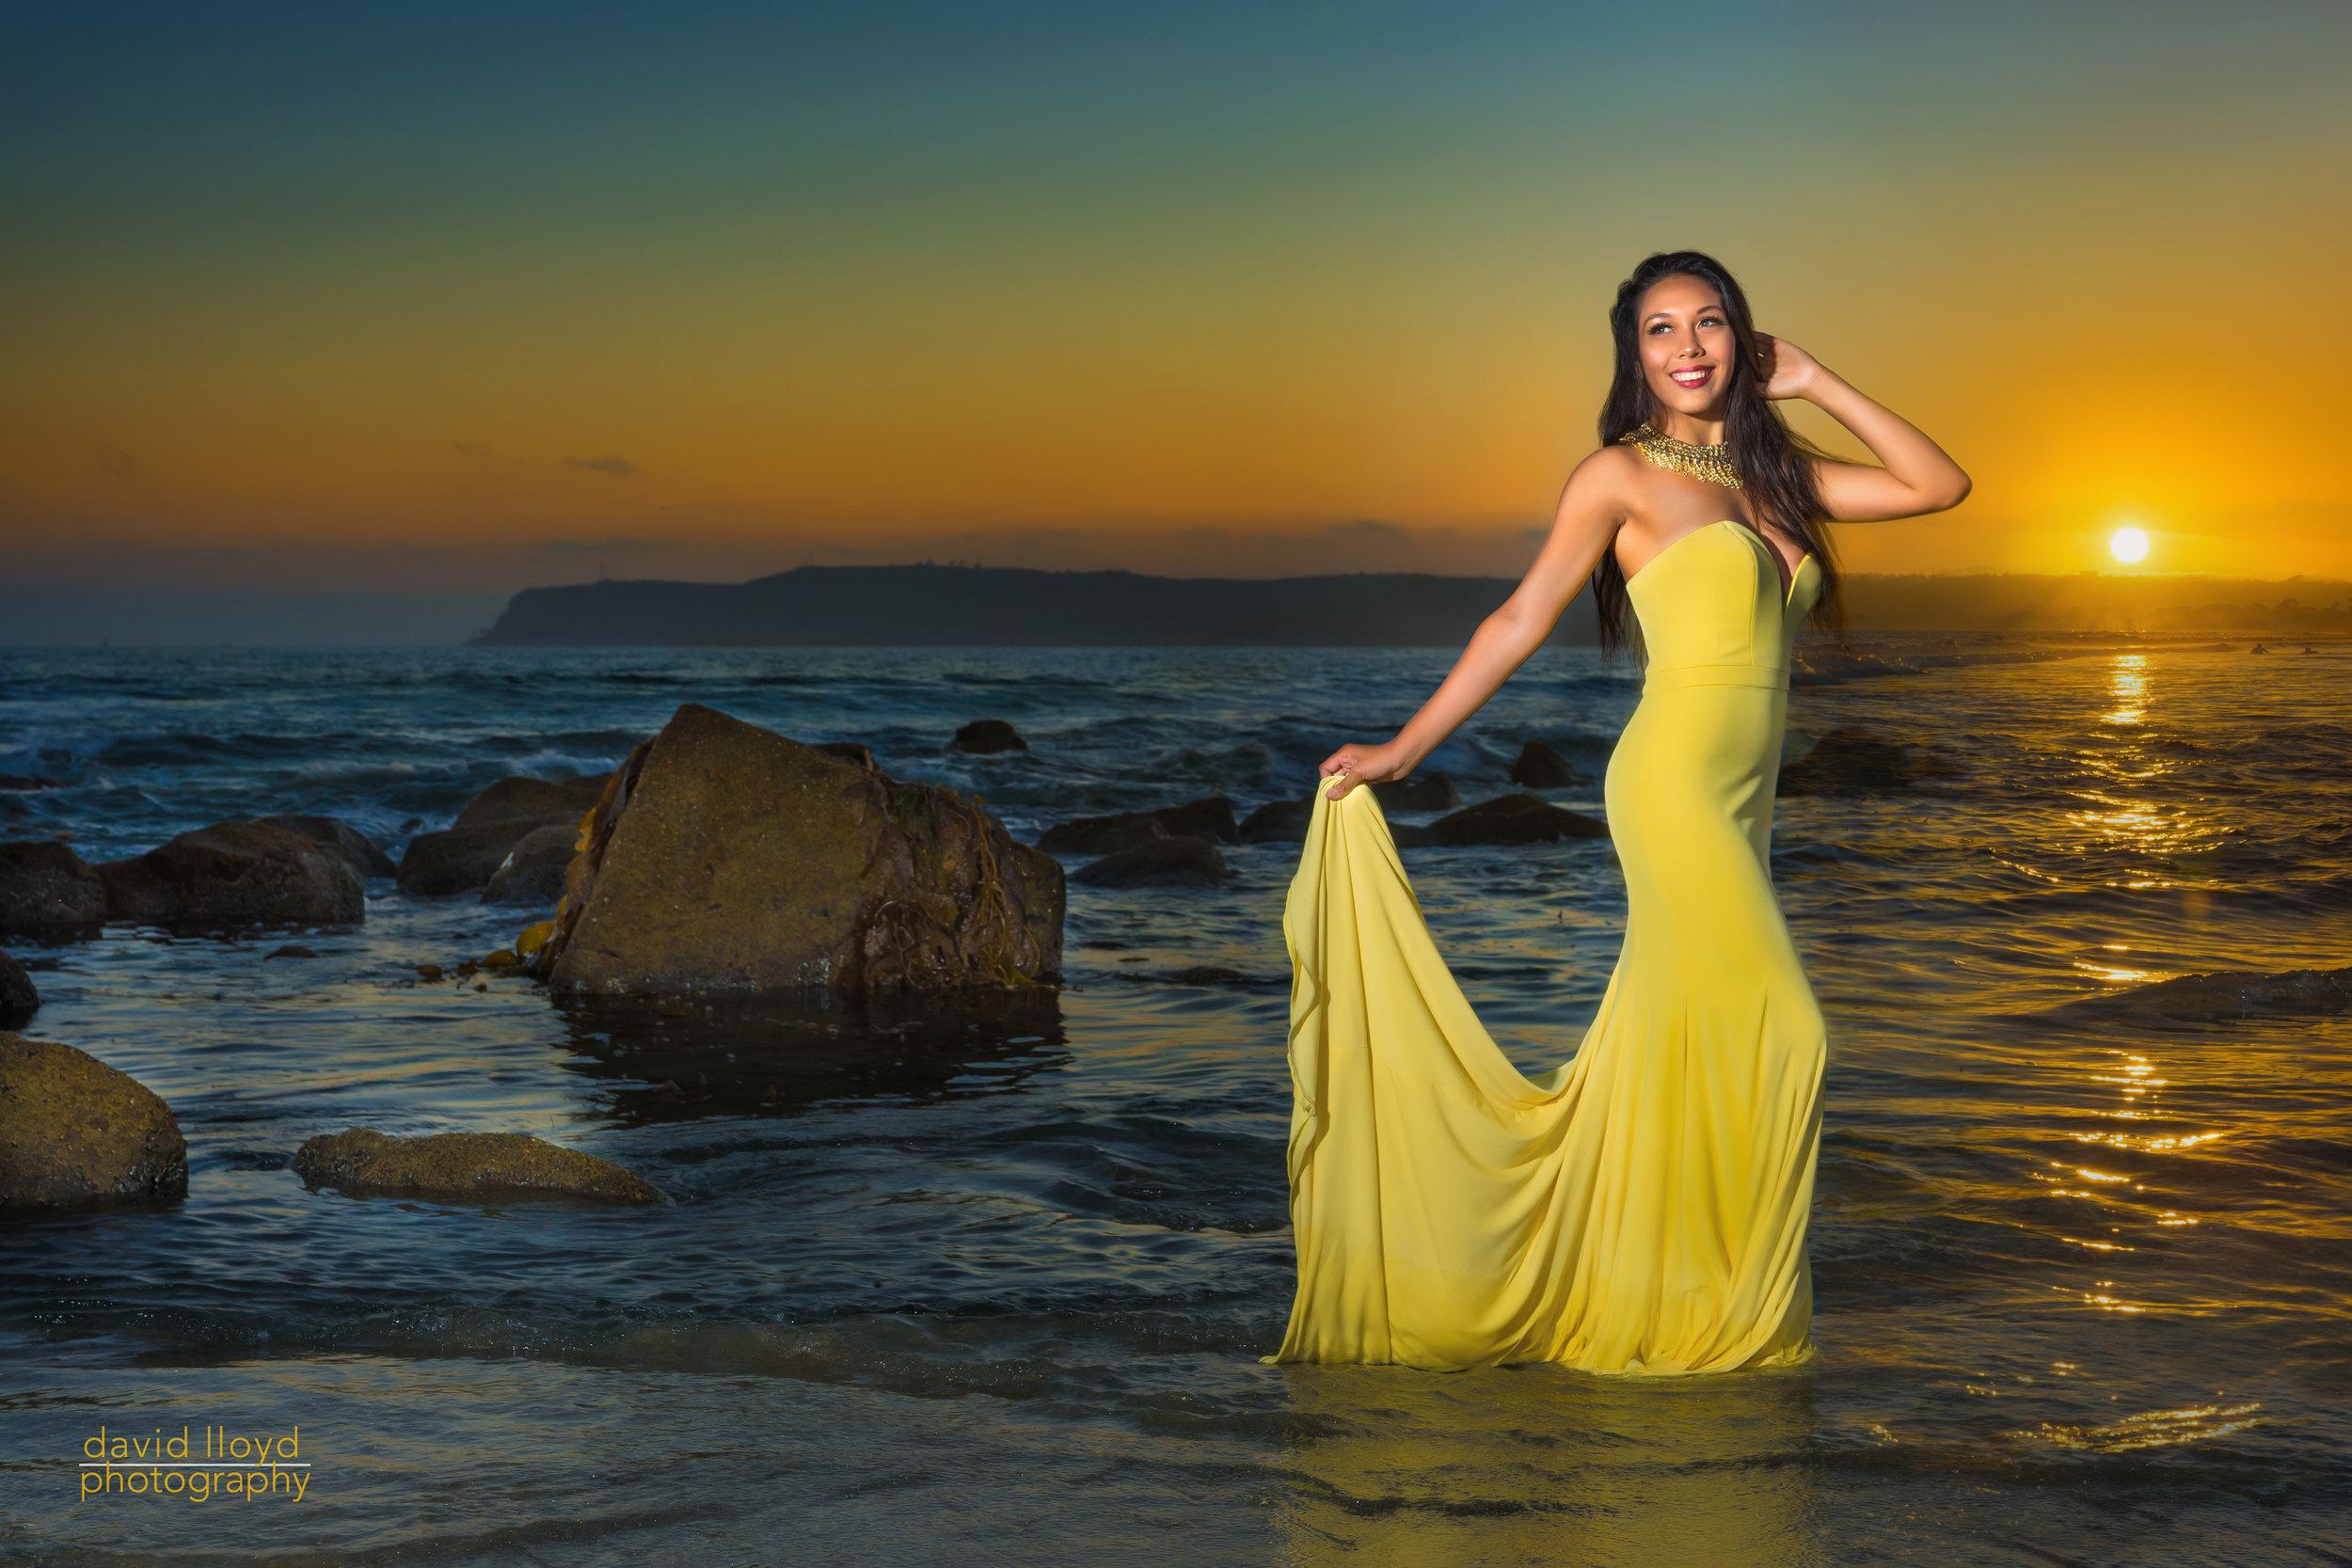 Our Beautiful Model for Coronado Beach, Jena Masero